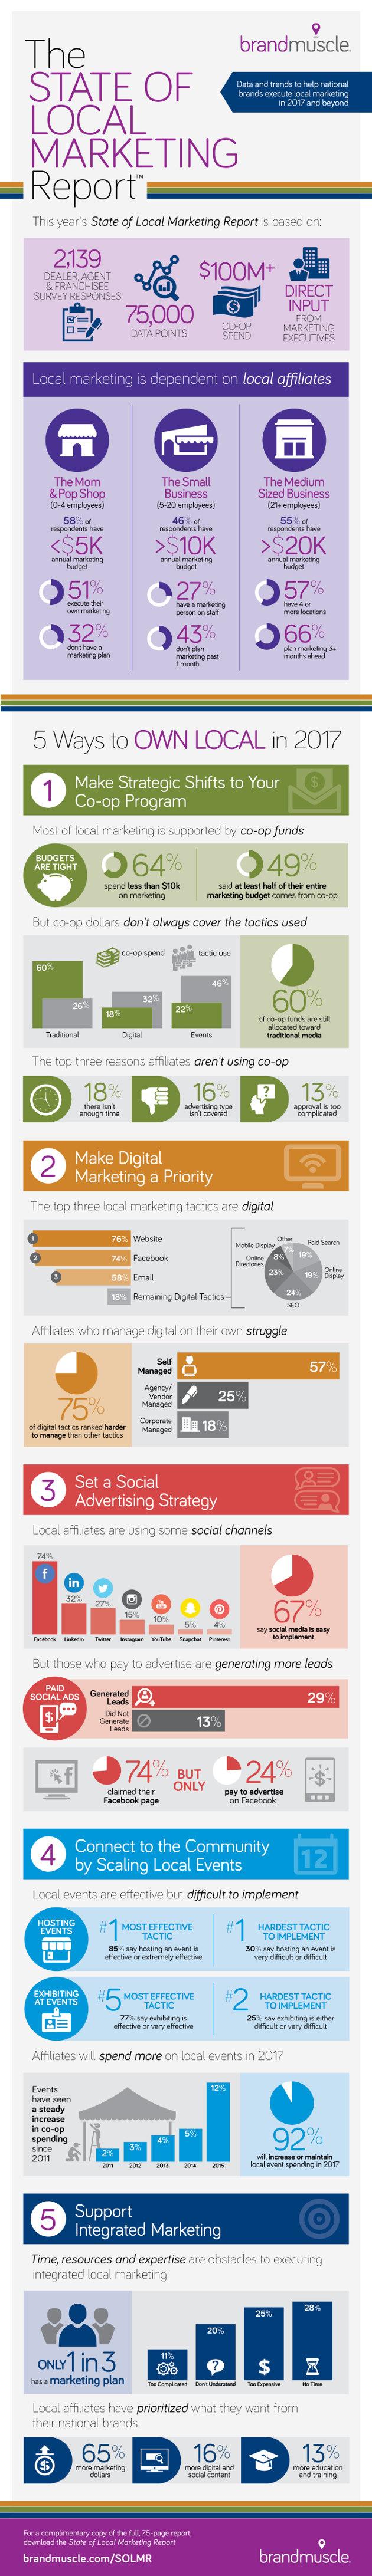 5 Key Local Social Media Marketing Tactics [Infographic] | Social Media Today